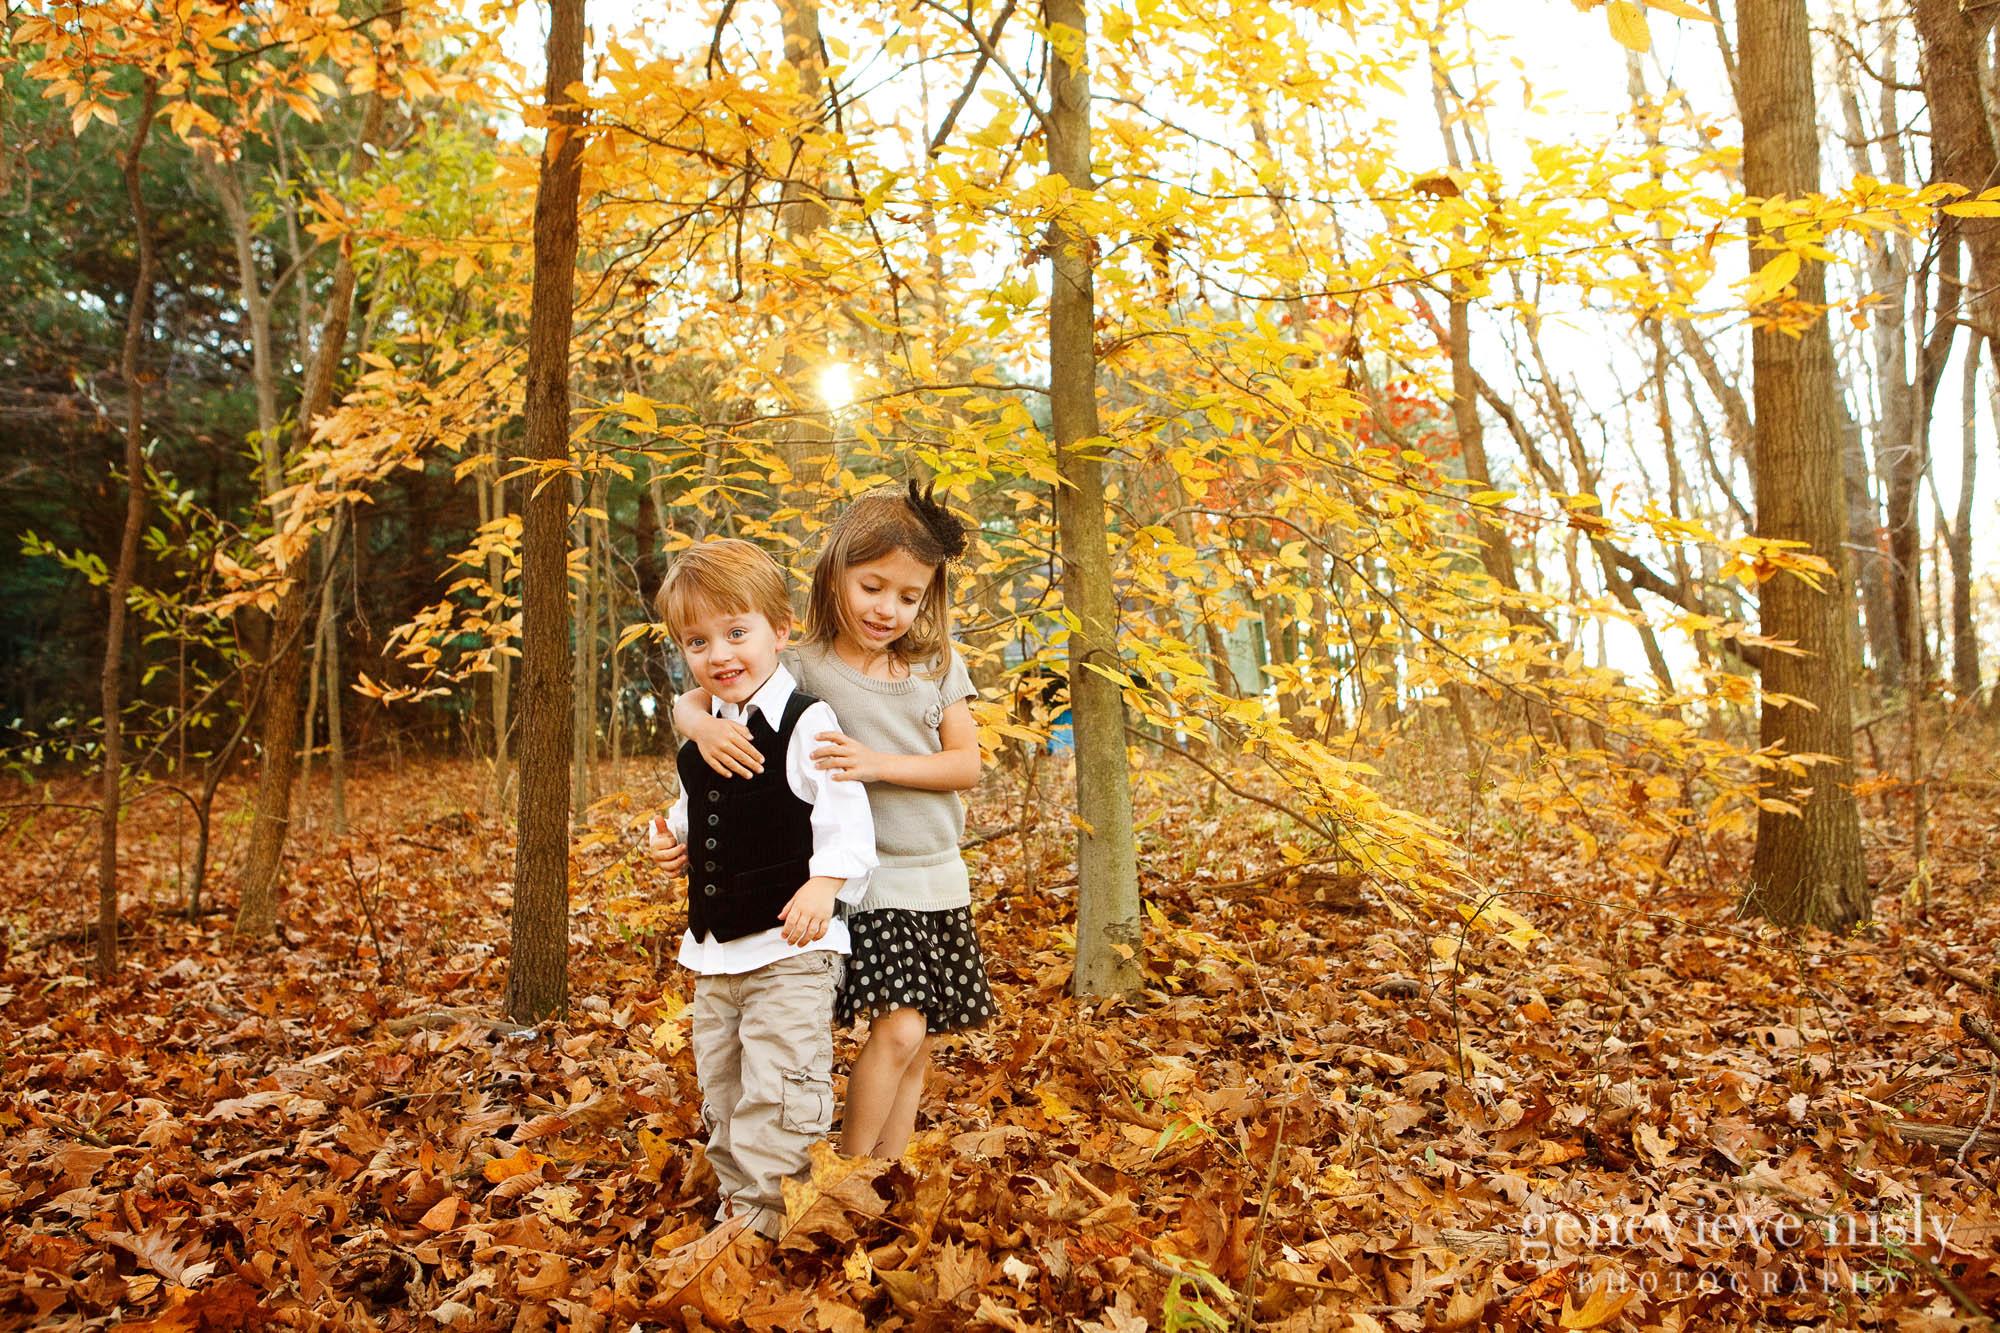 Copyright Genevieve Nisly Photography, Green, Kids, Ohio, Portraits